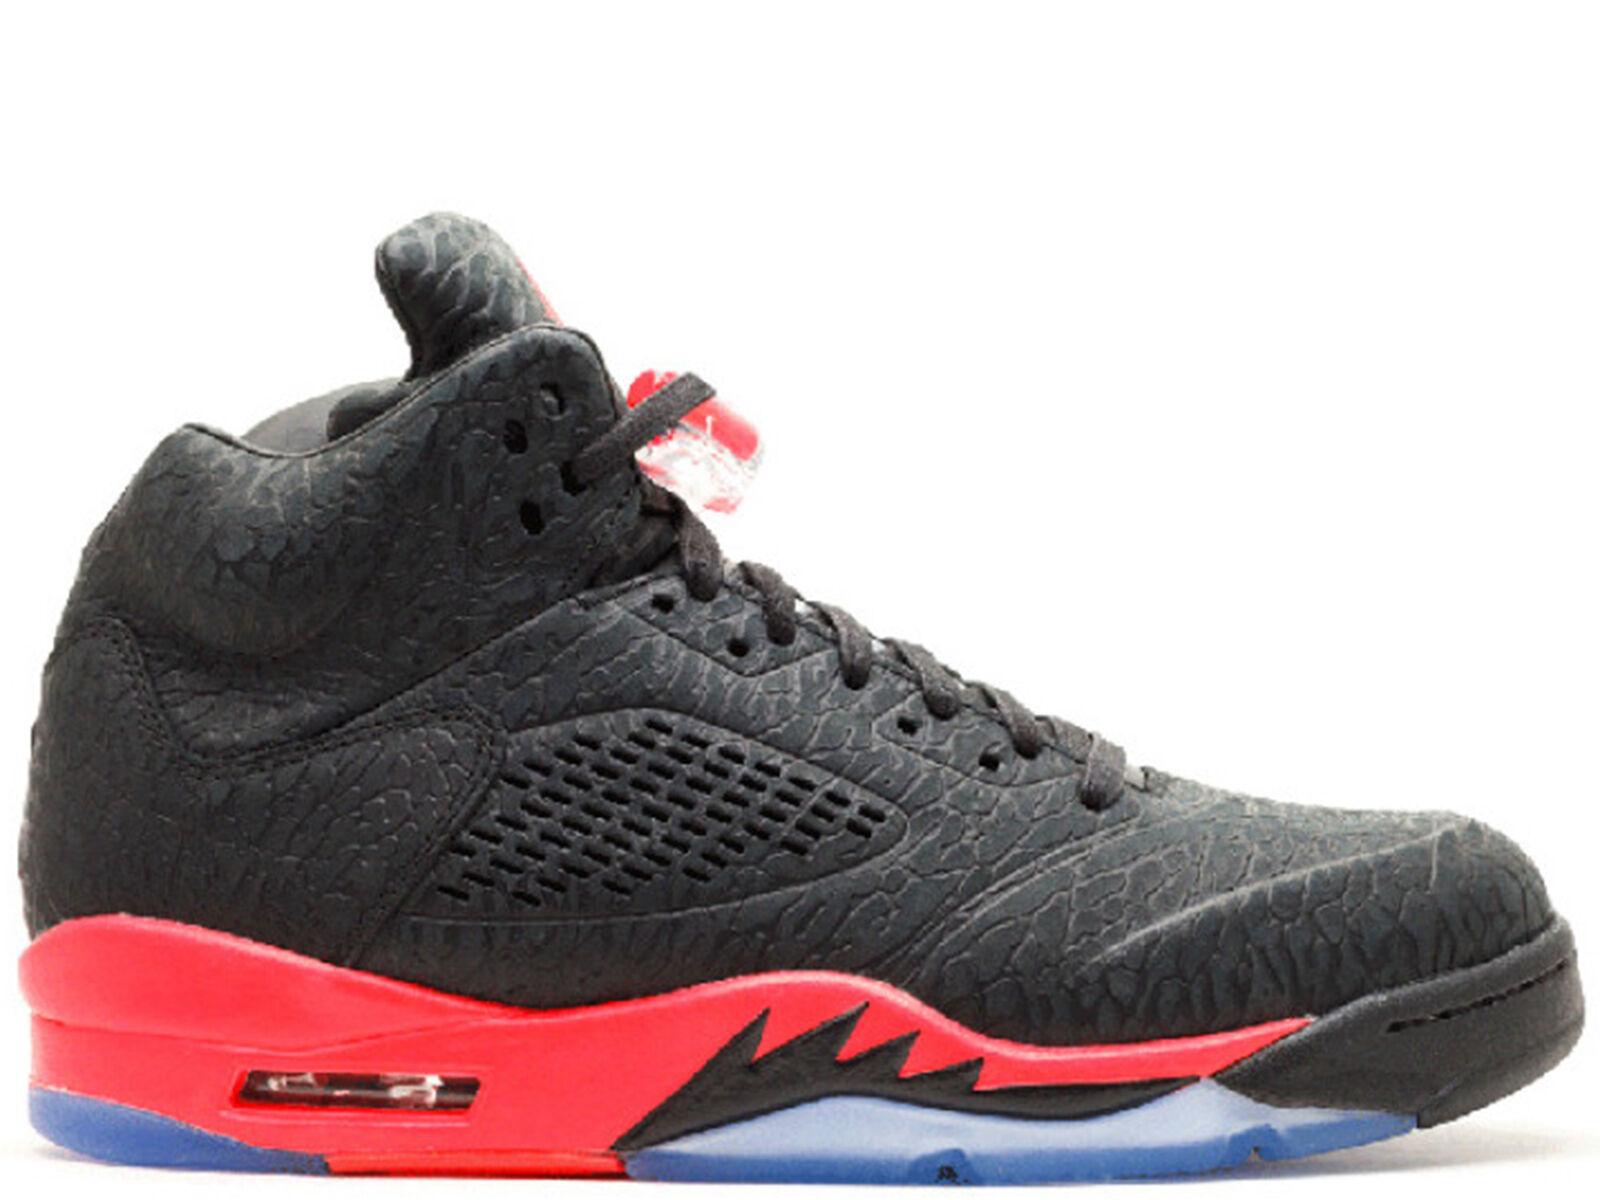 Mens Brand New New New Air Jordan 5 Retro  3Lab5  Athletic Fashion scarpe da ginnastica [599581 010] d97236